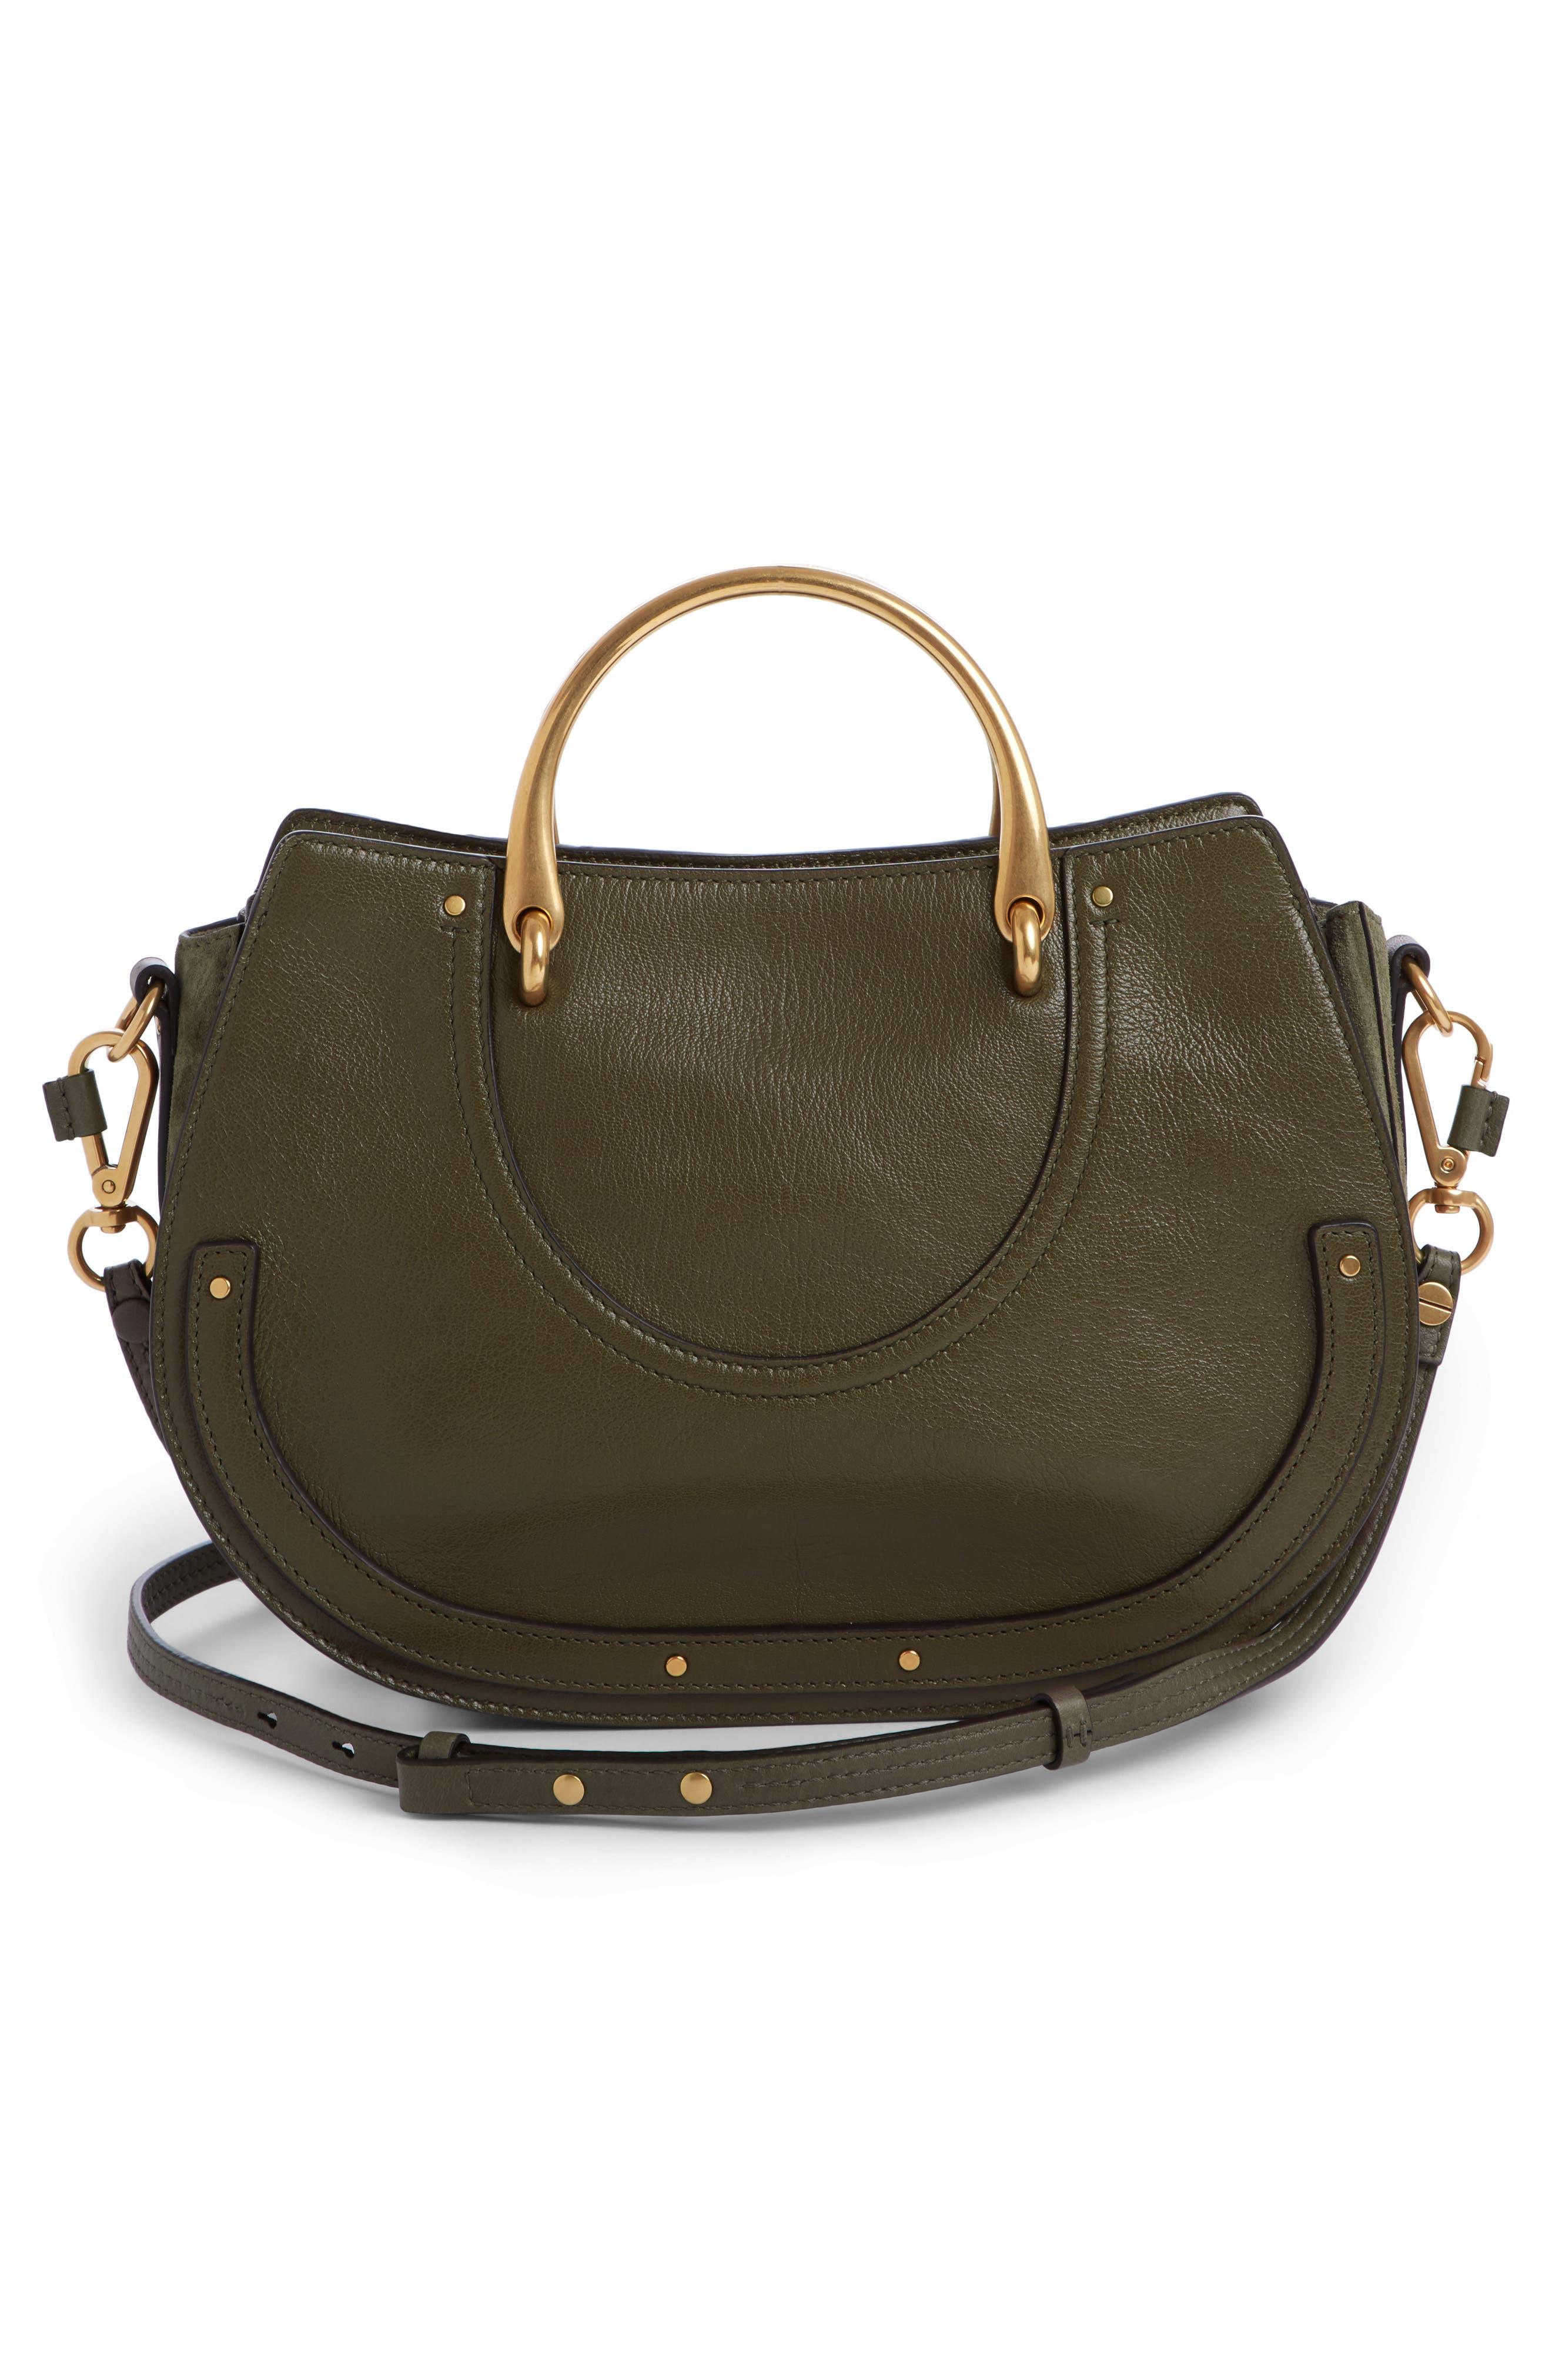 Medium Pixie Top Handle Leather Satchel,                             Alternate thumbnail 2, color,                             Intense Green